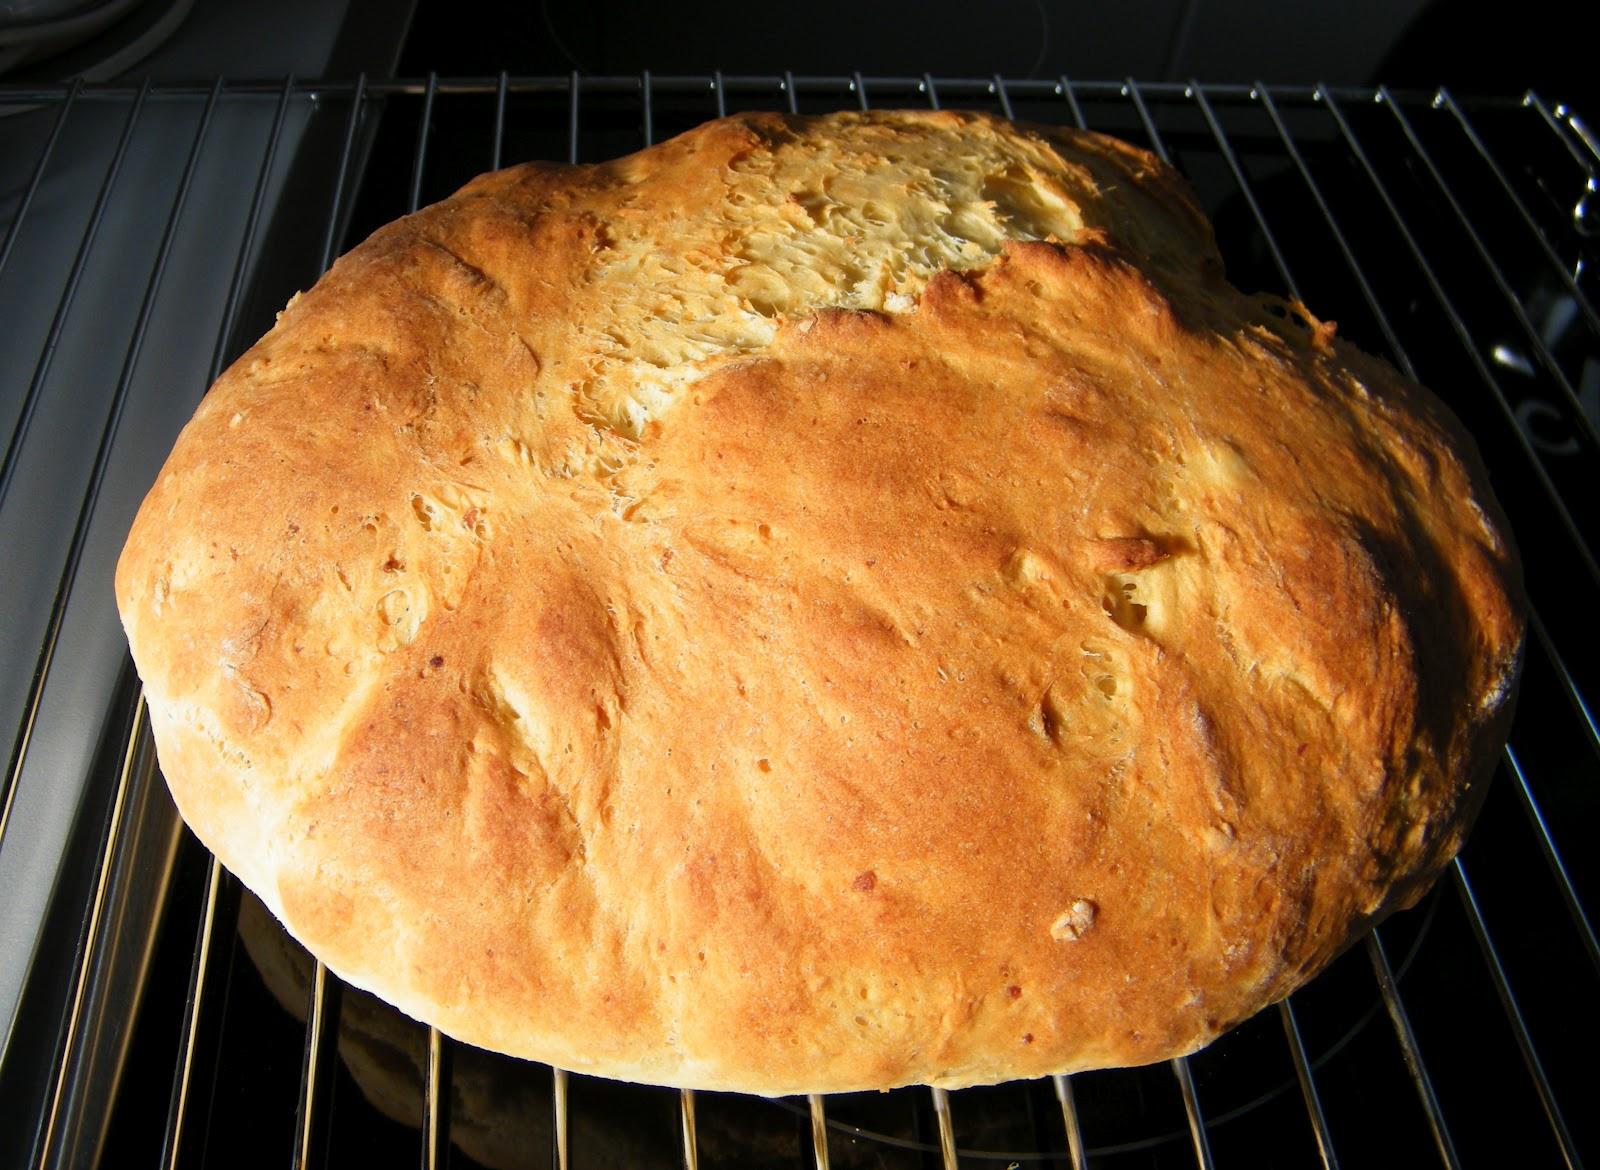 Potato bread - recipe (including photos) | Life in Luxembourg